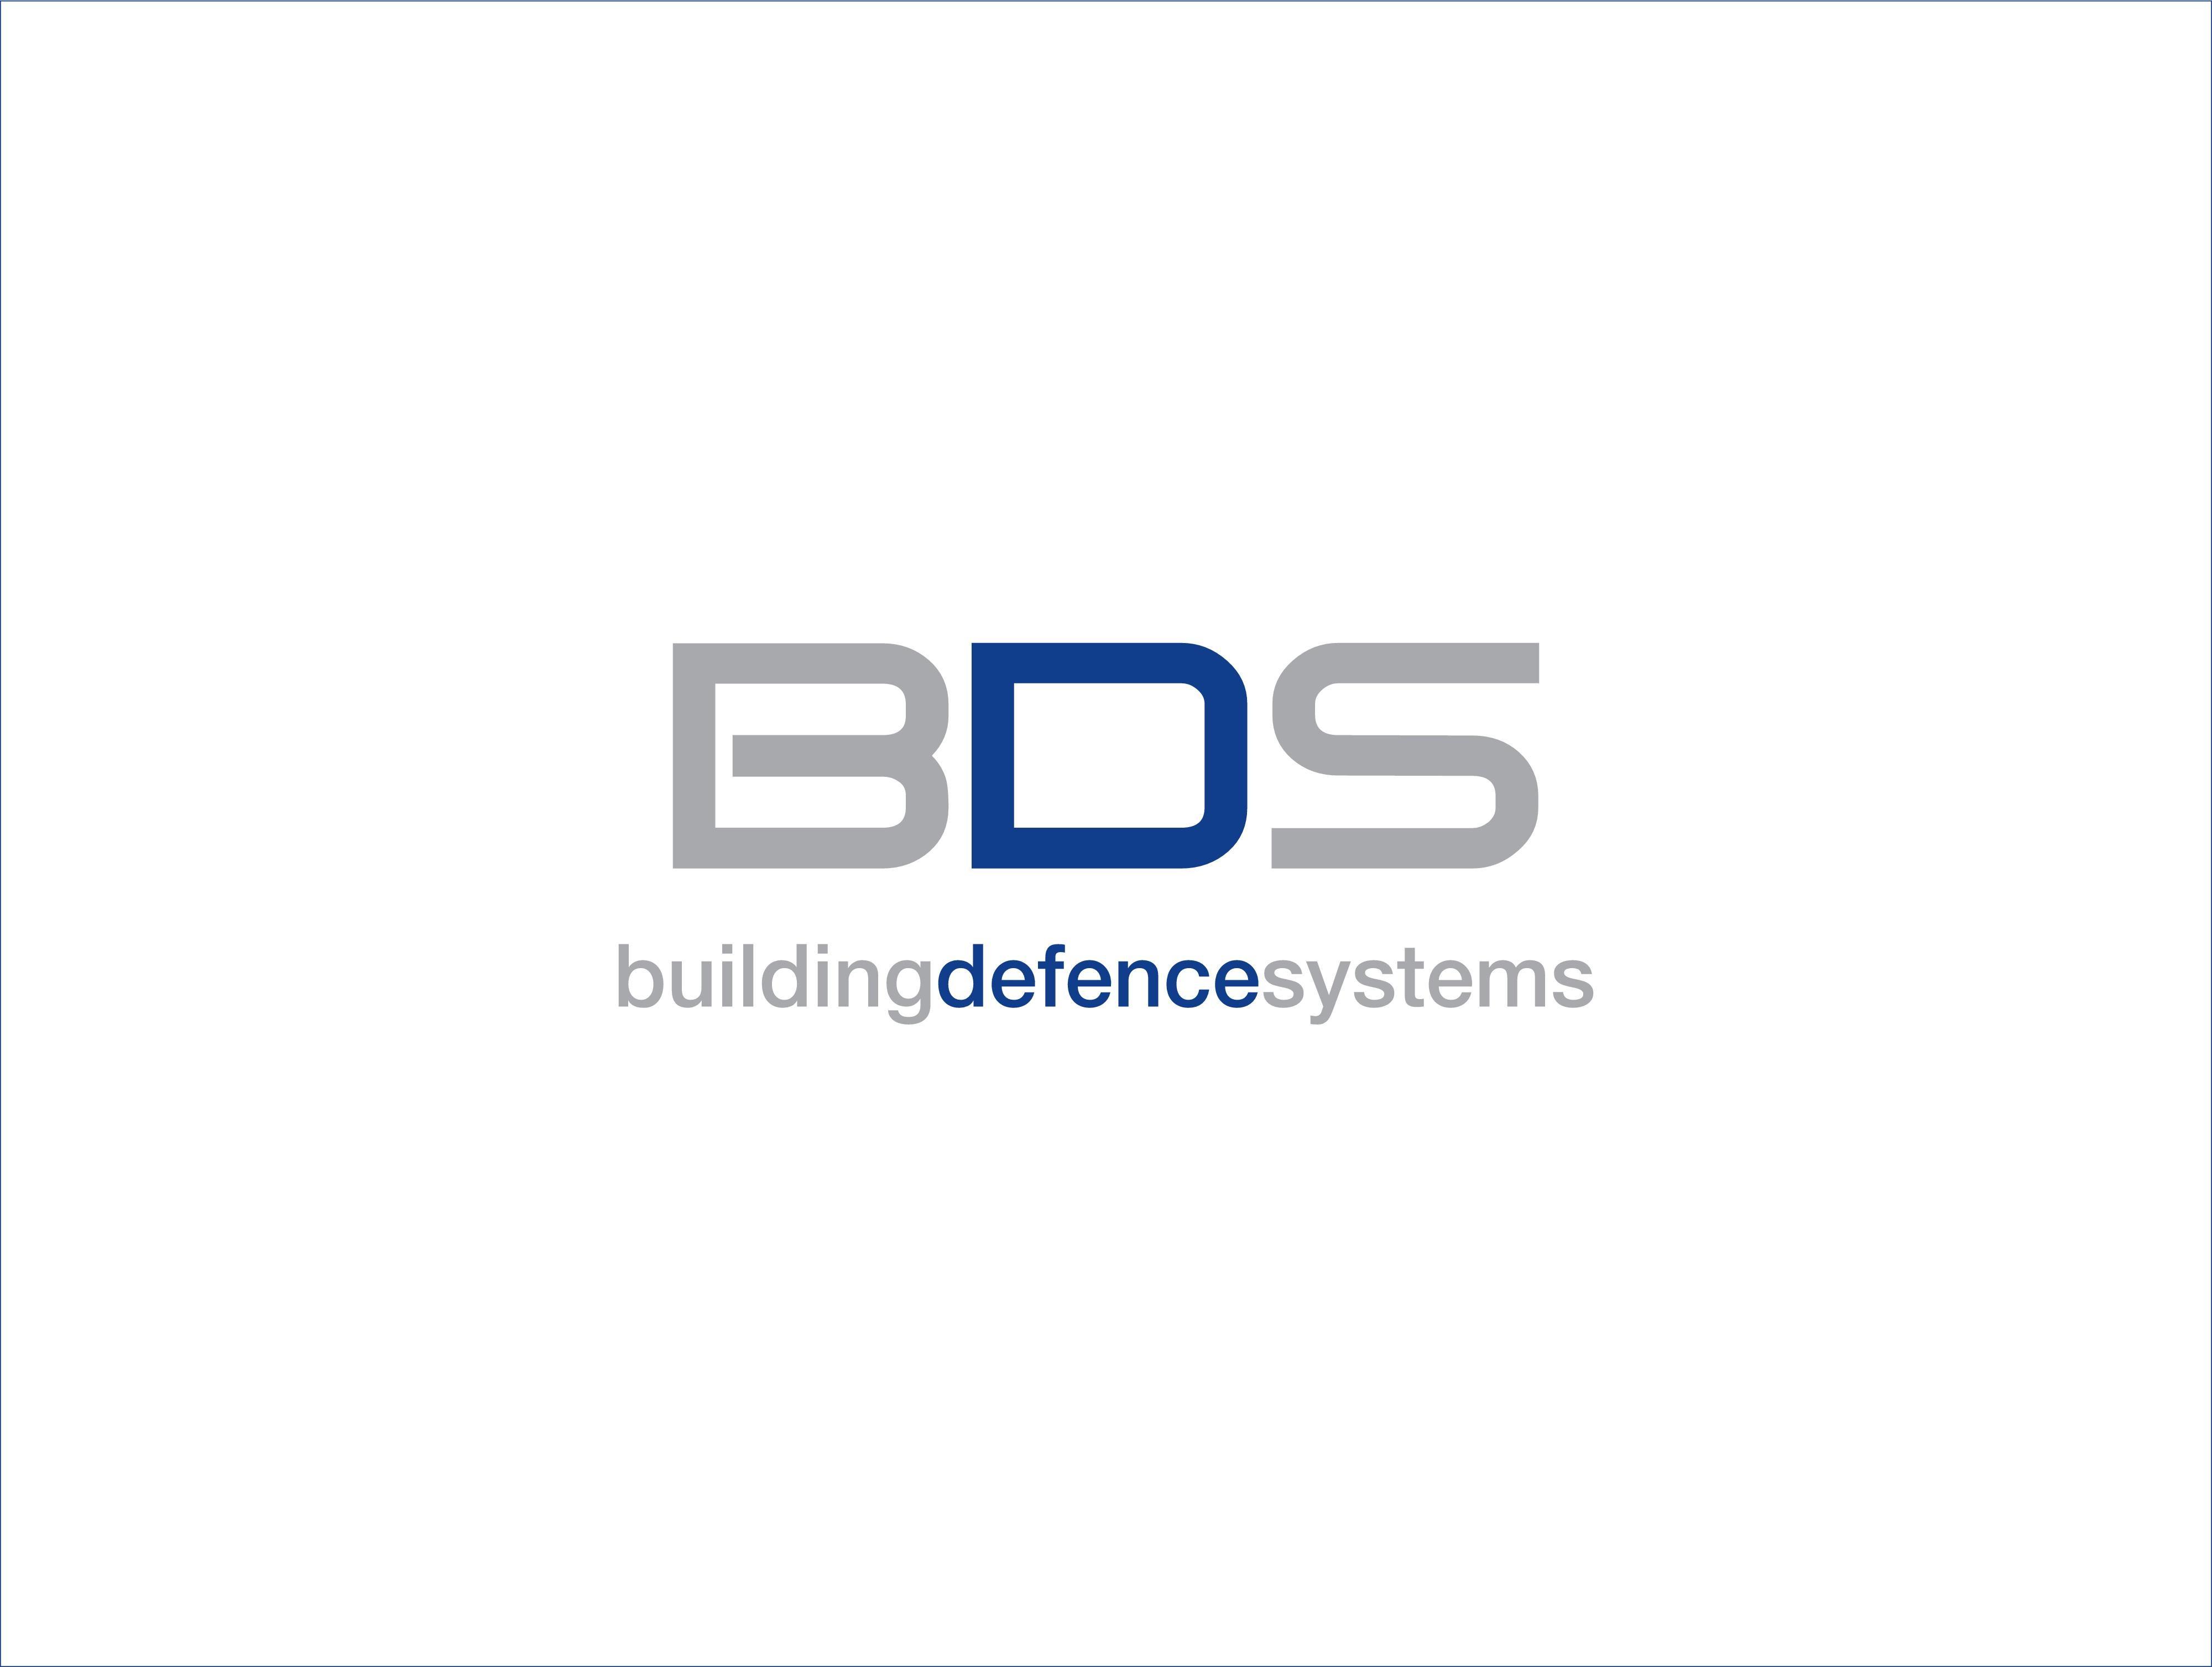 Building Defence Systems | LinkedIn